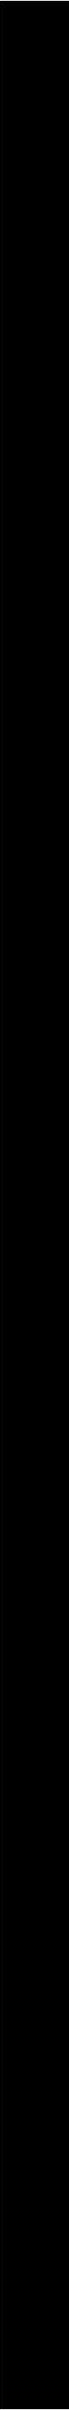 corel rectangle.jpg